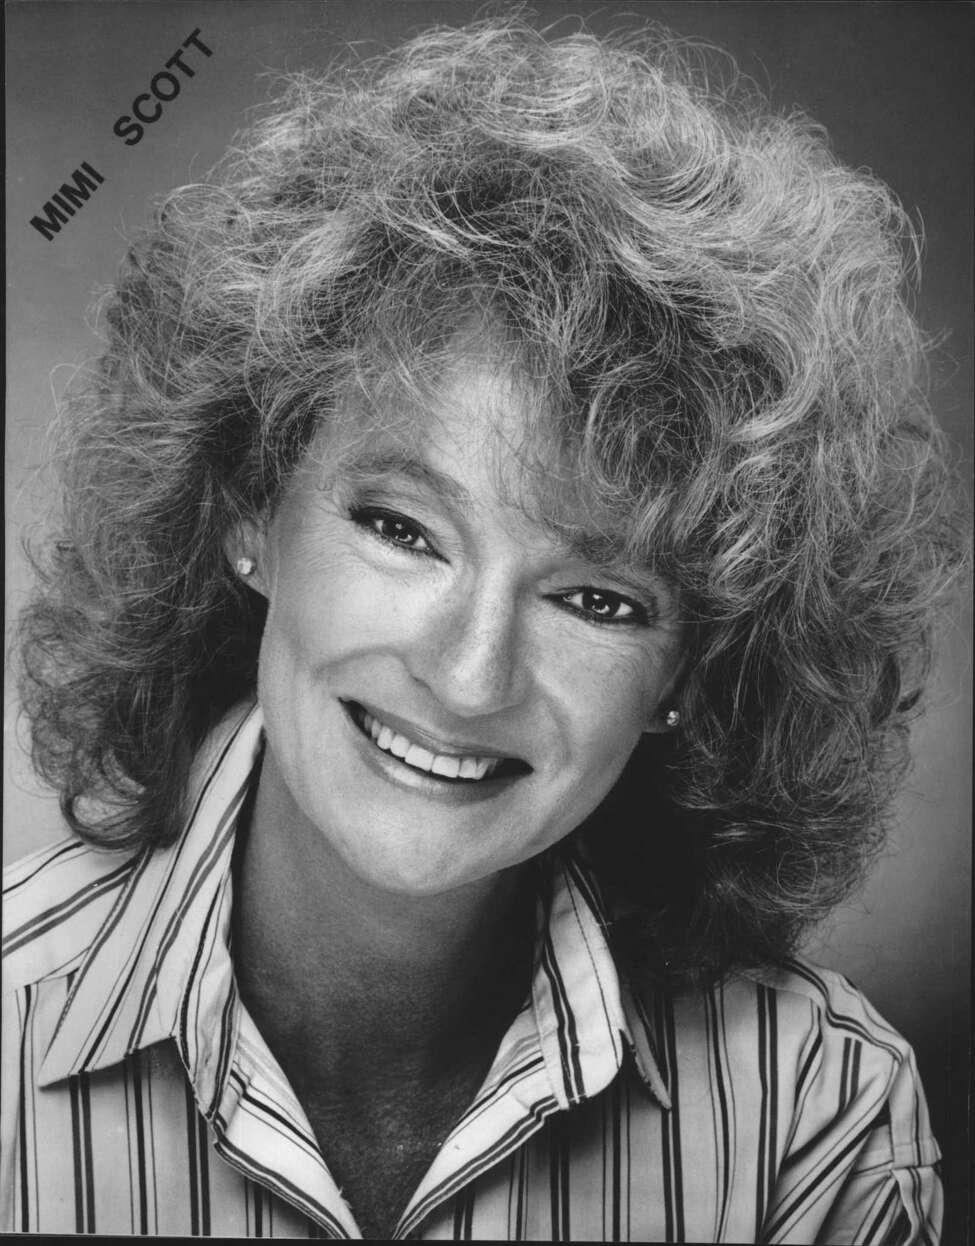 Actress Mimi Scott. March 08, 1989 (Times Union Archive)